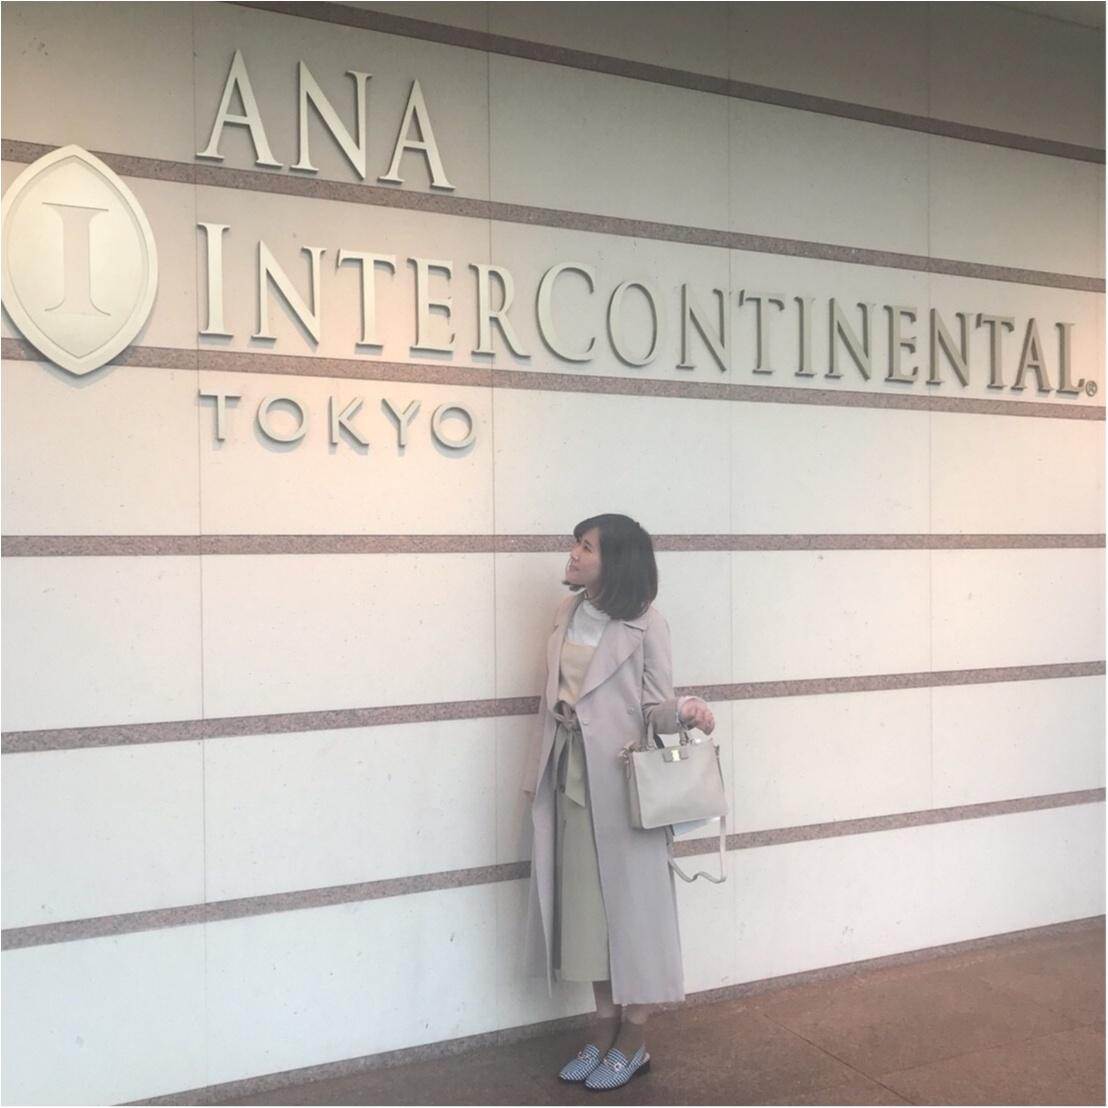 ANAインターコンチネンタルホテルでアフタヌーンティー女子会!大大大好きなあのモアハピ部OGさんにも会えました❤︎_1